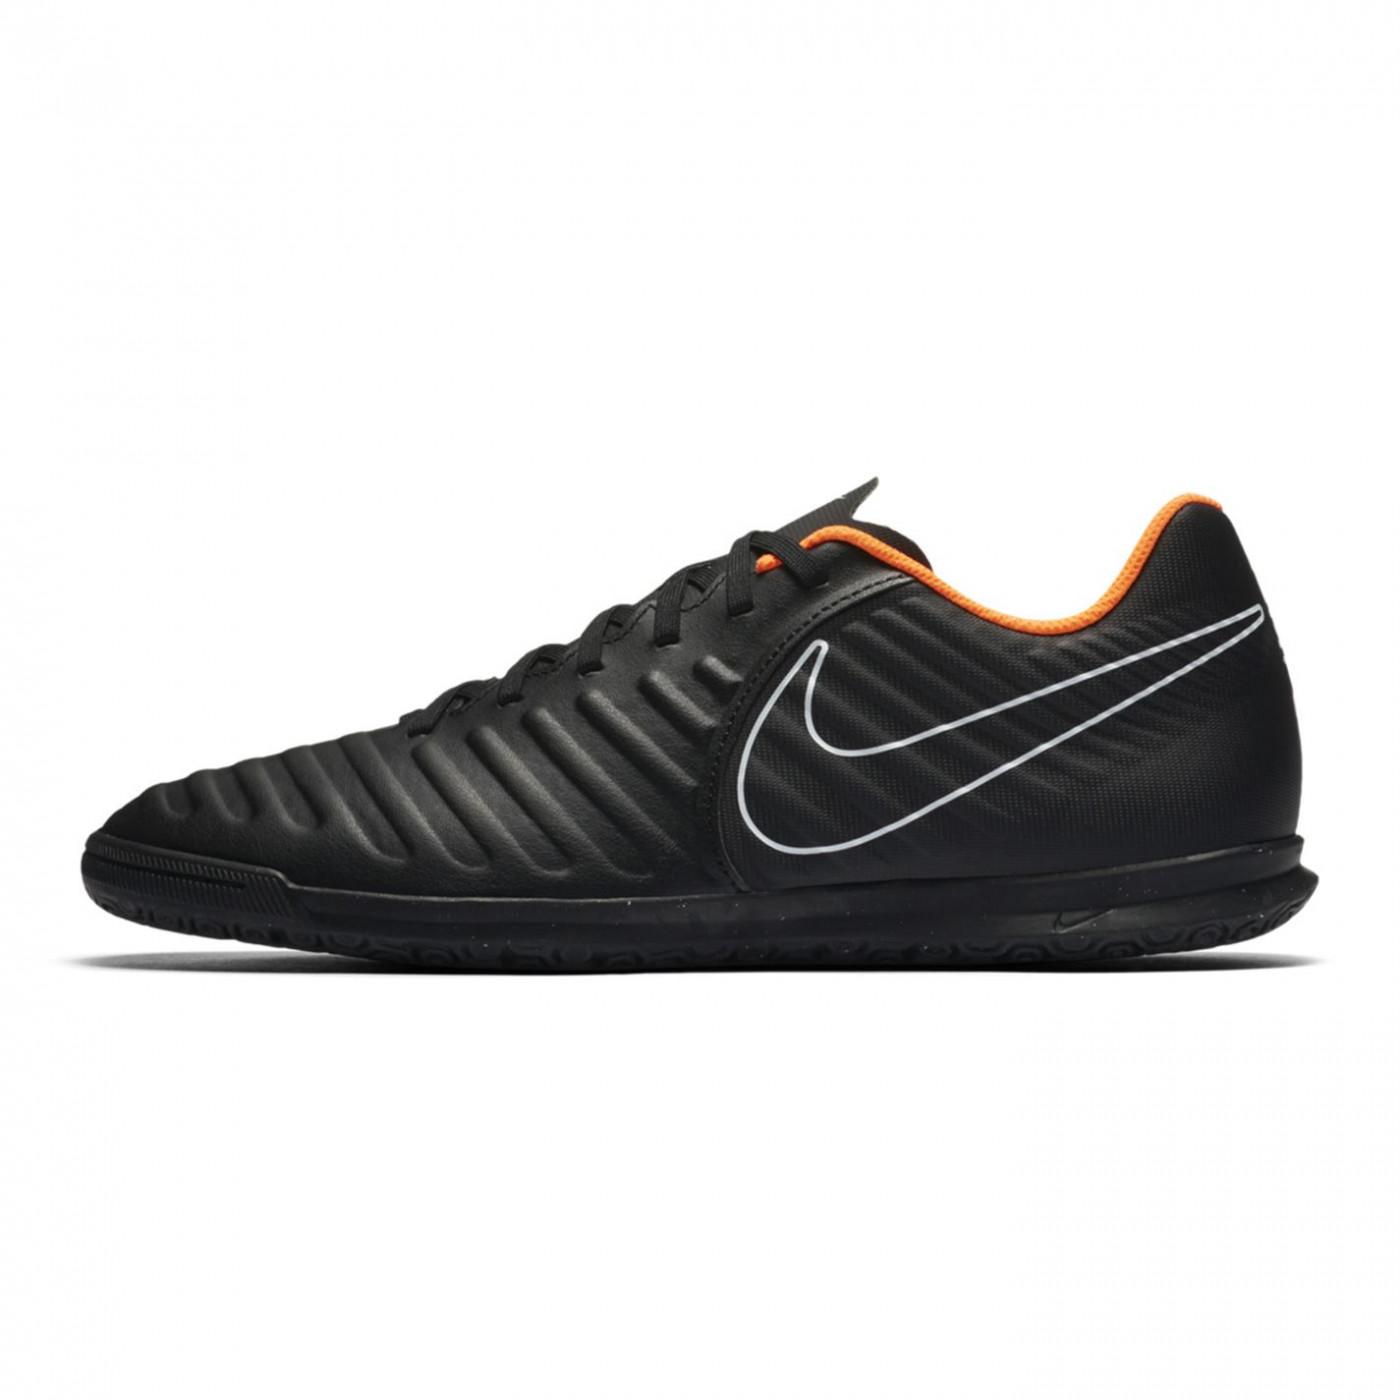 95f94e5ece51 Nike Tiempo Legend Club Indoor Mens Football Trainers - FACTCOOL